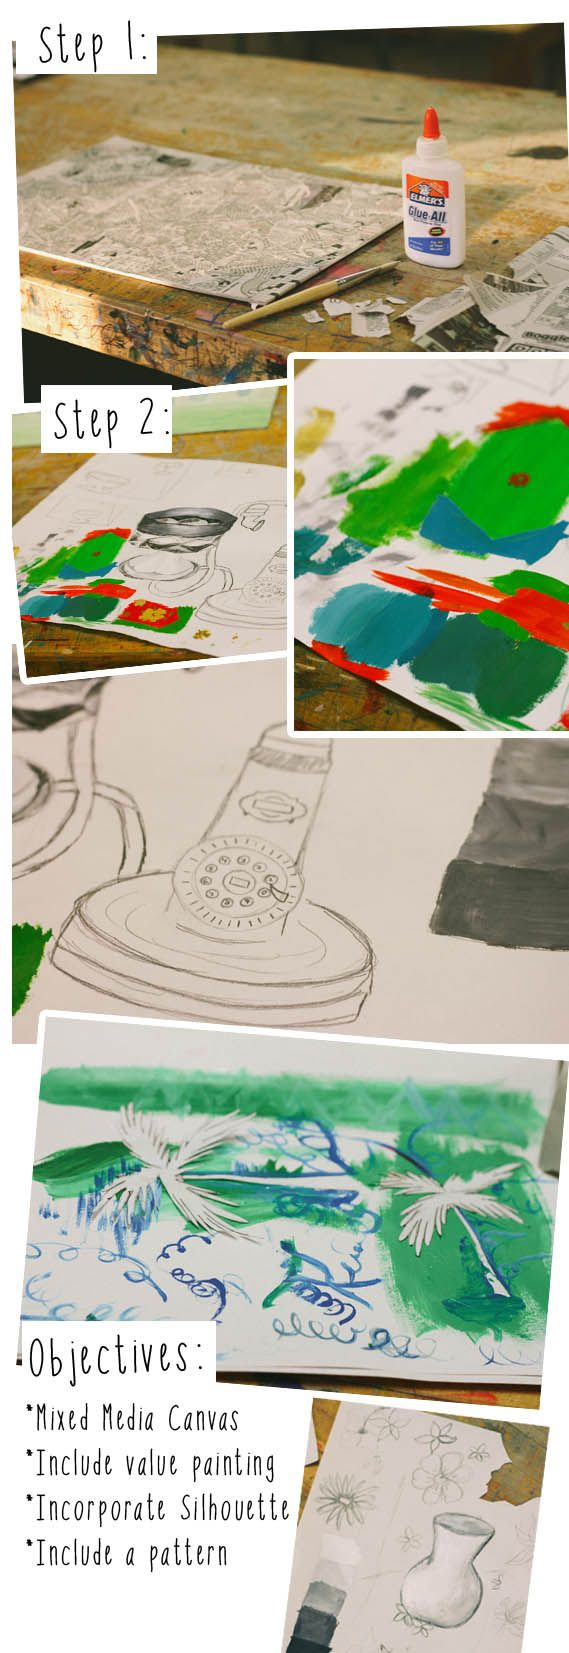 High School Art lesson: Mixed Media Painting [Art II class]